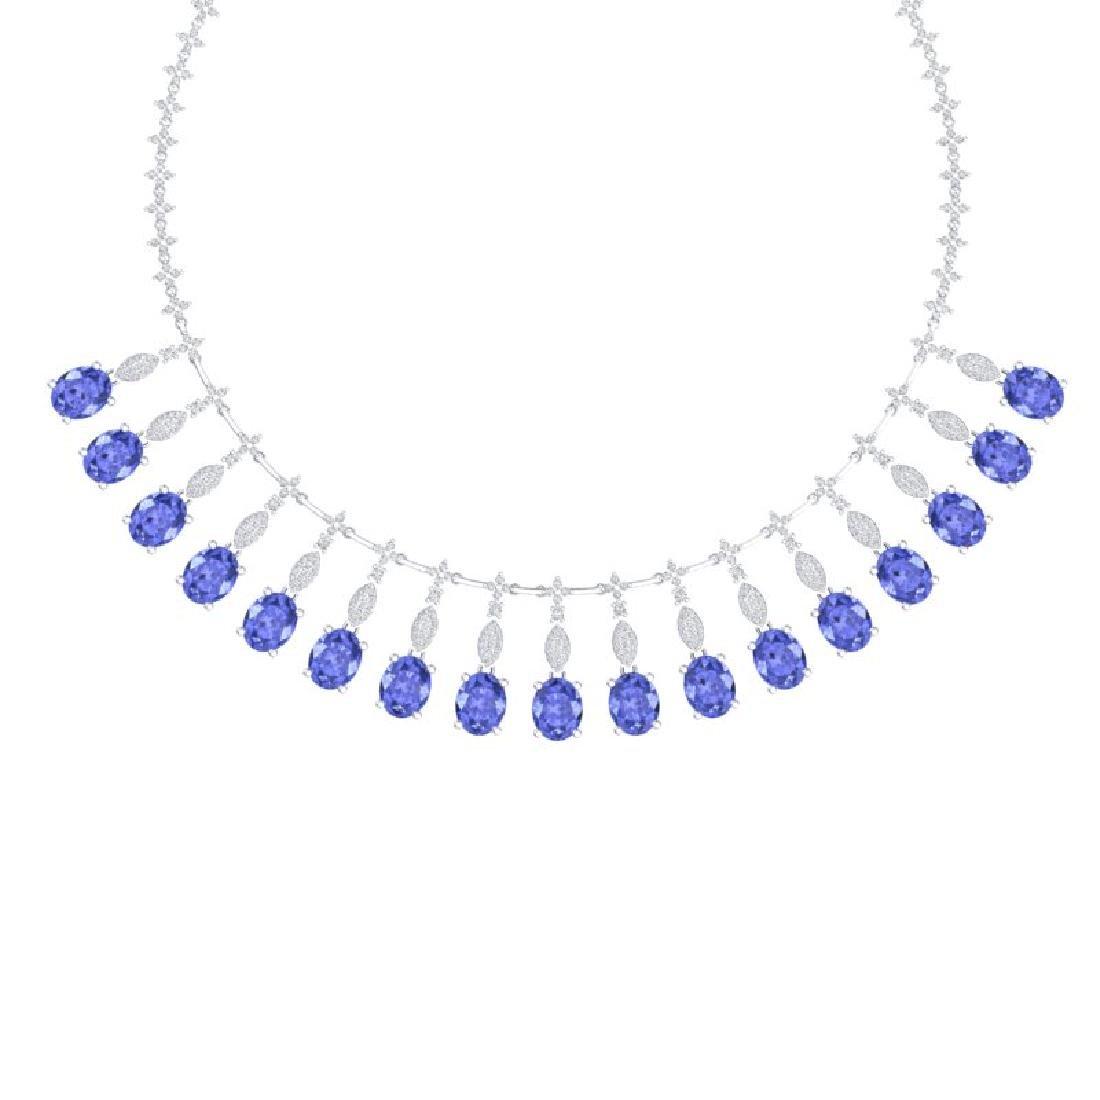 57.15 CTW Royalty Tanzanite & VS Diamond Necklace 18K